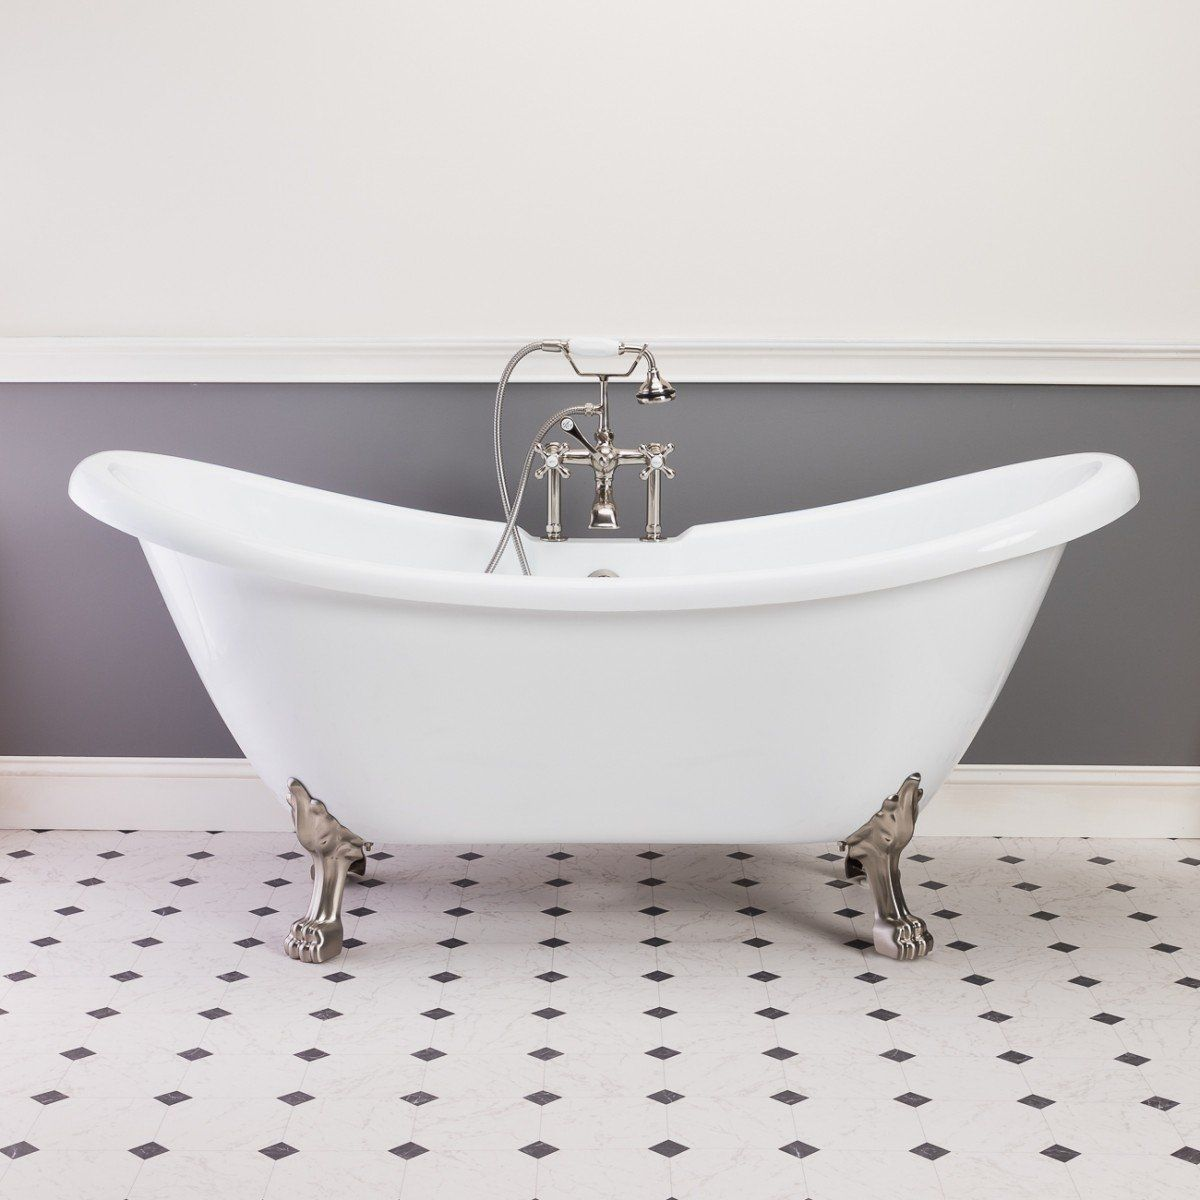 Florence 70 Inch Acrylic Double Slipper Clawfoot Tub Rim Faucet Drillings Lion Paw Feet Clawfoot Tub Tub